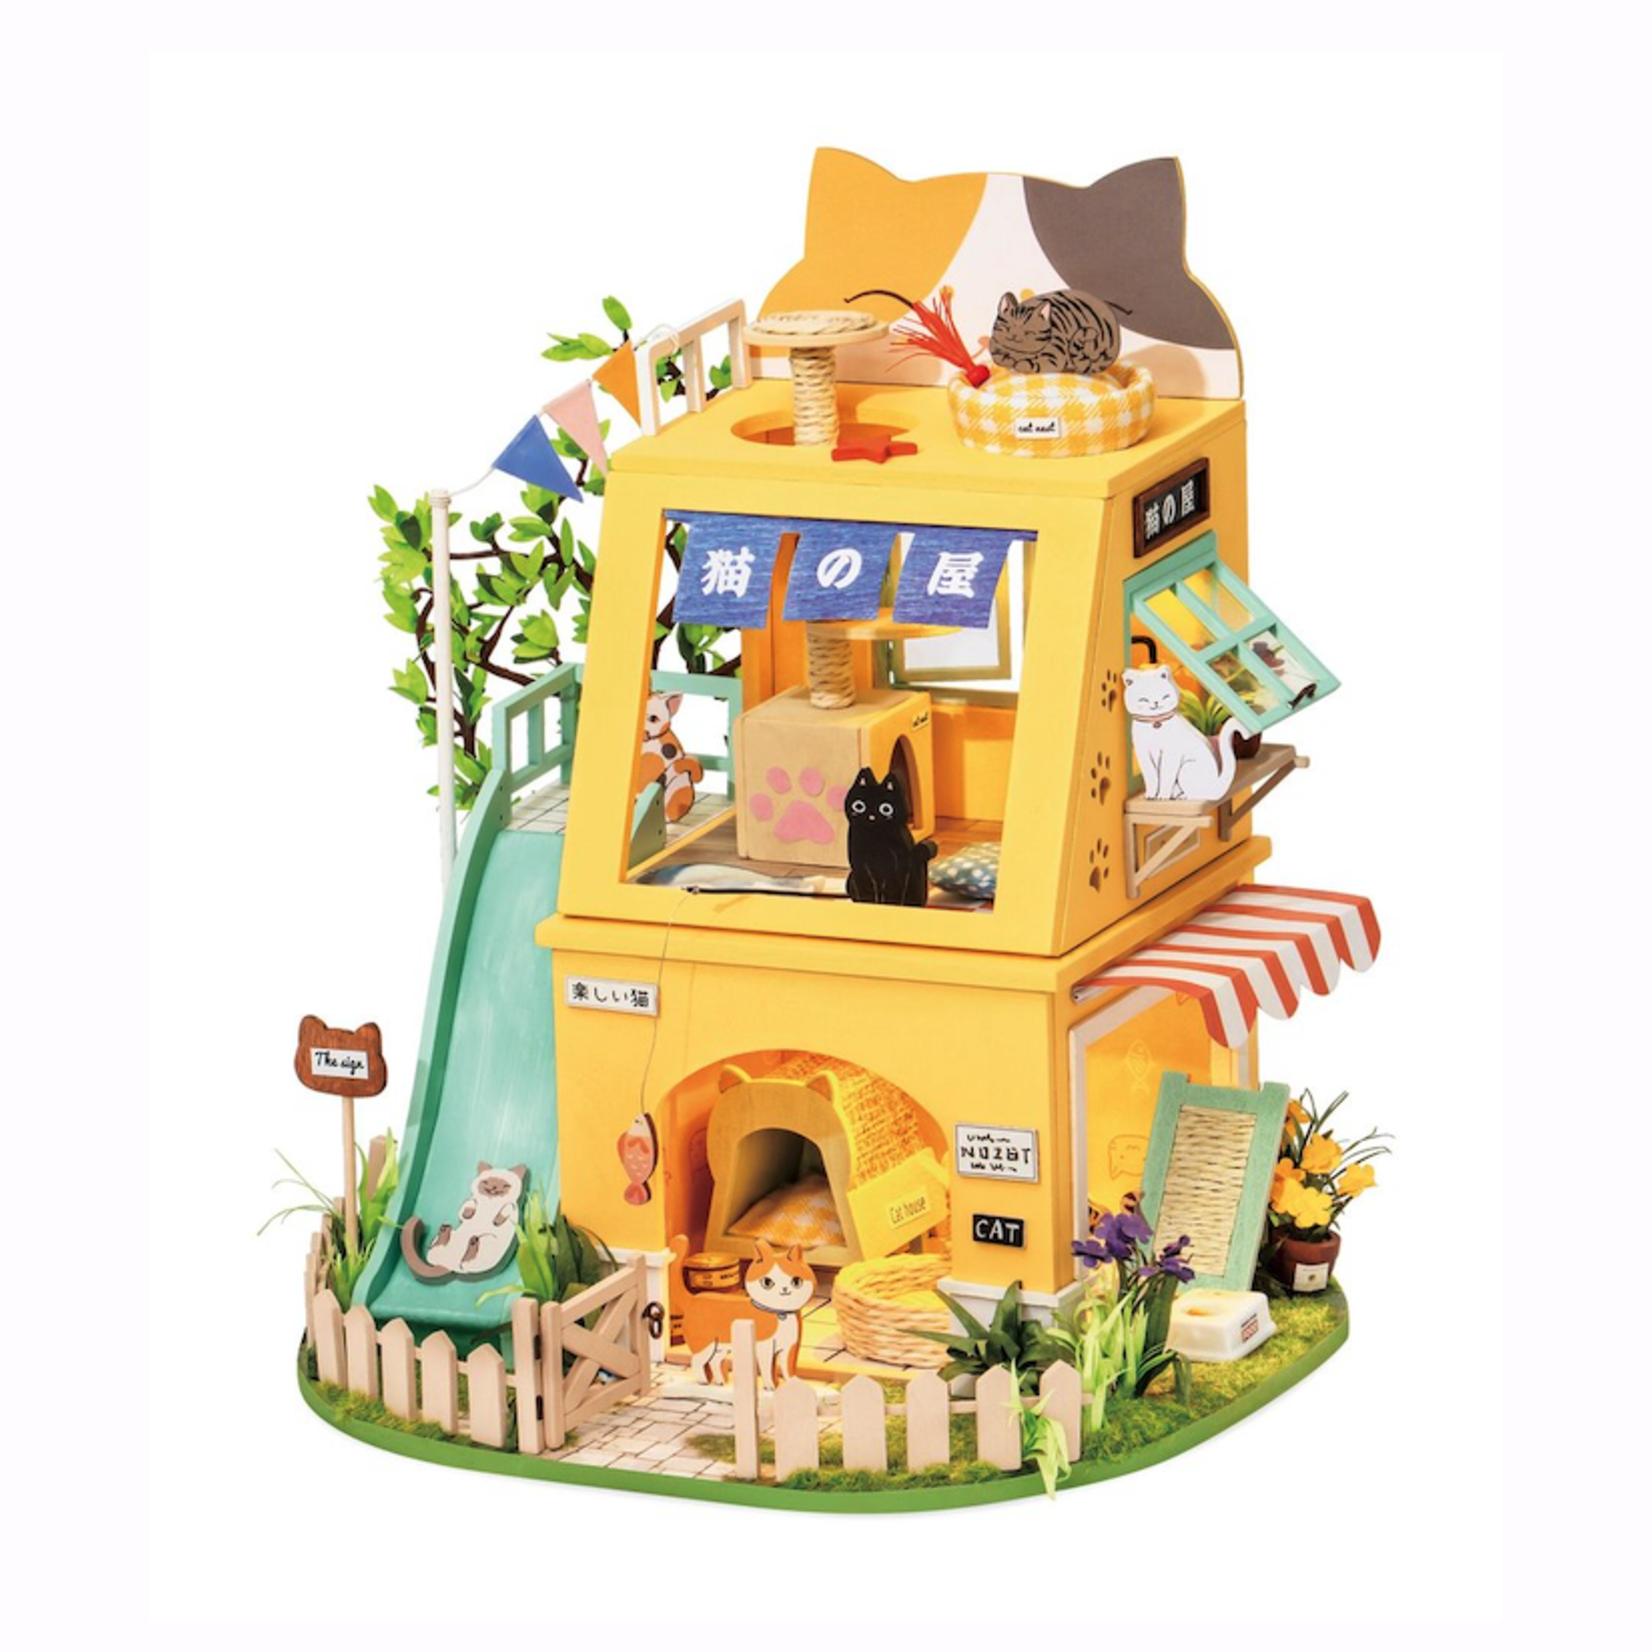 Hands Craft DIY Miniature Dollhouse Kit